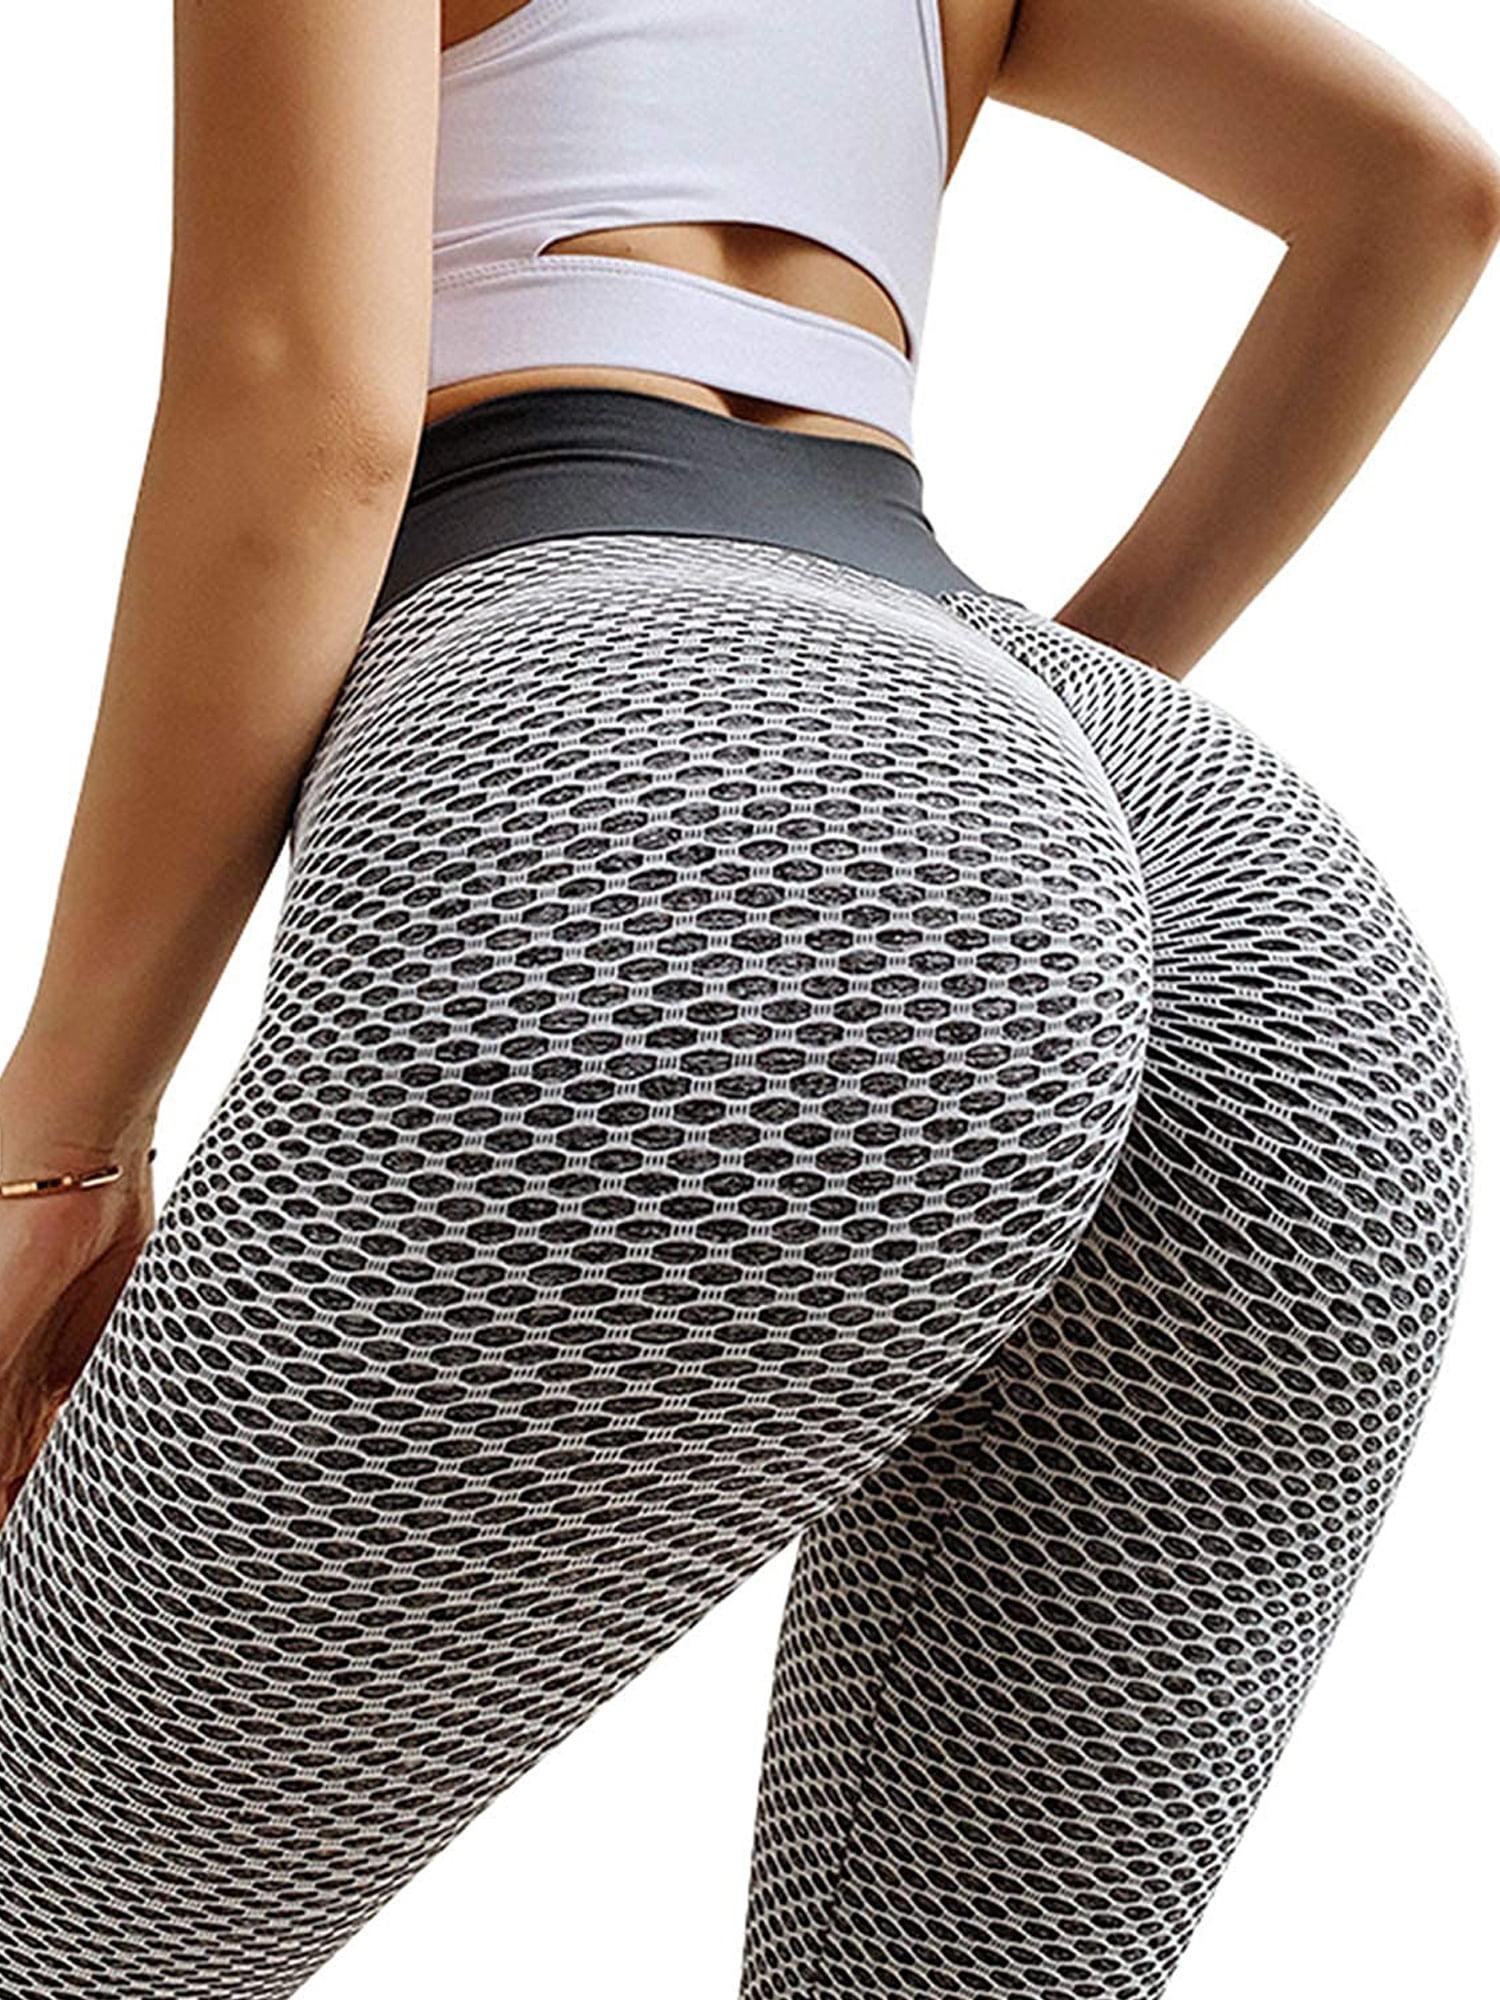 Womens High Waist Yoga Shorts Tummy Control Slimming Booty Leggings Workout Running Butt Lift Pants